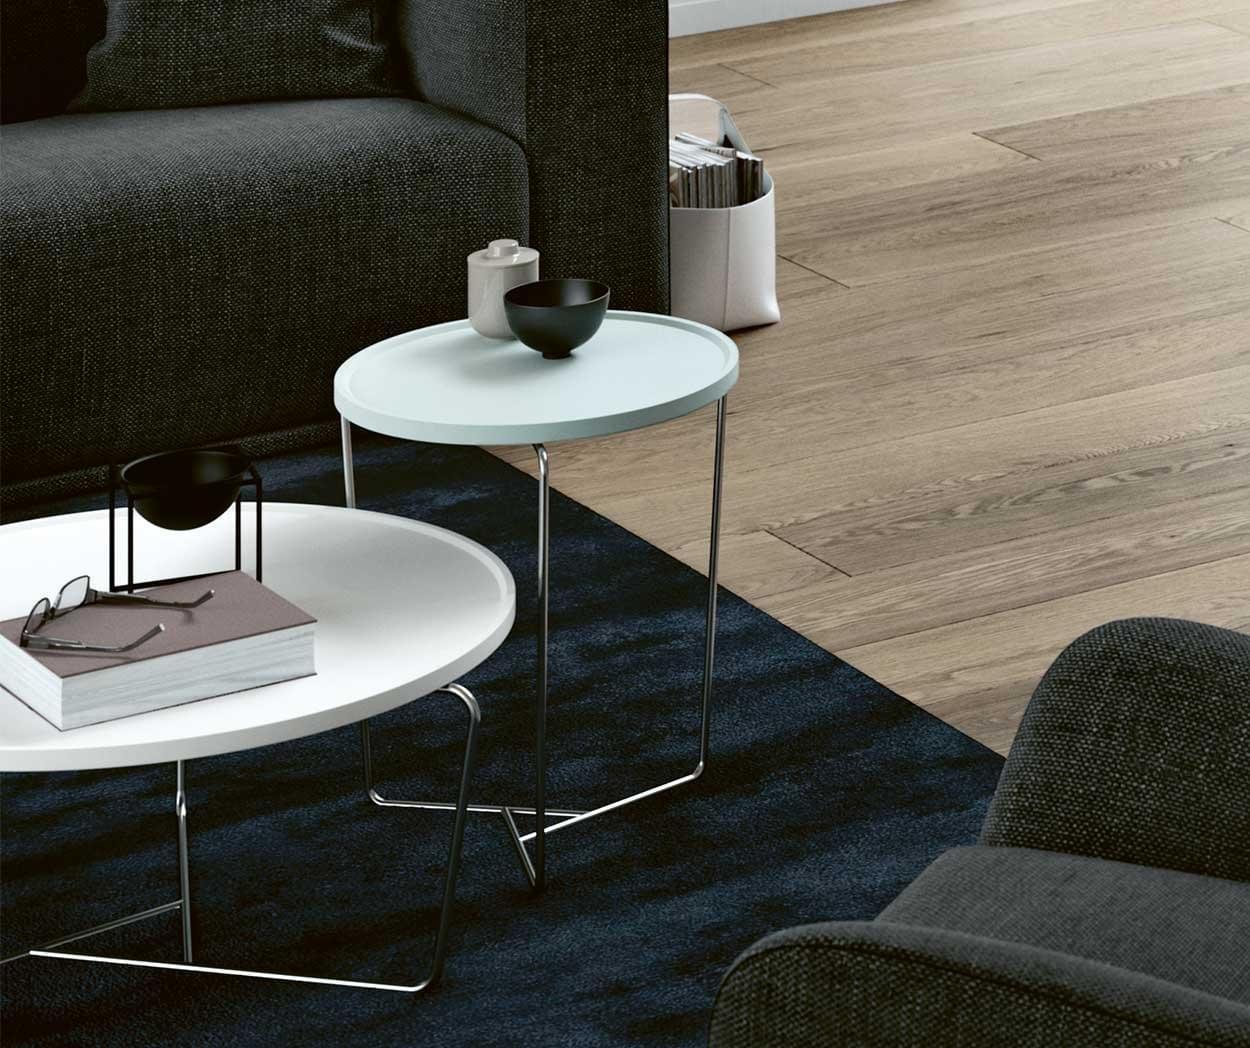 table-2x2blocks_01_1250x1048